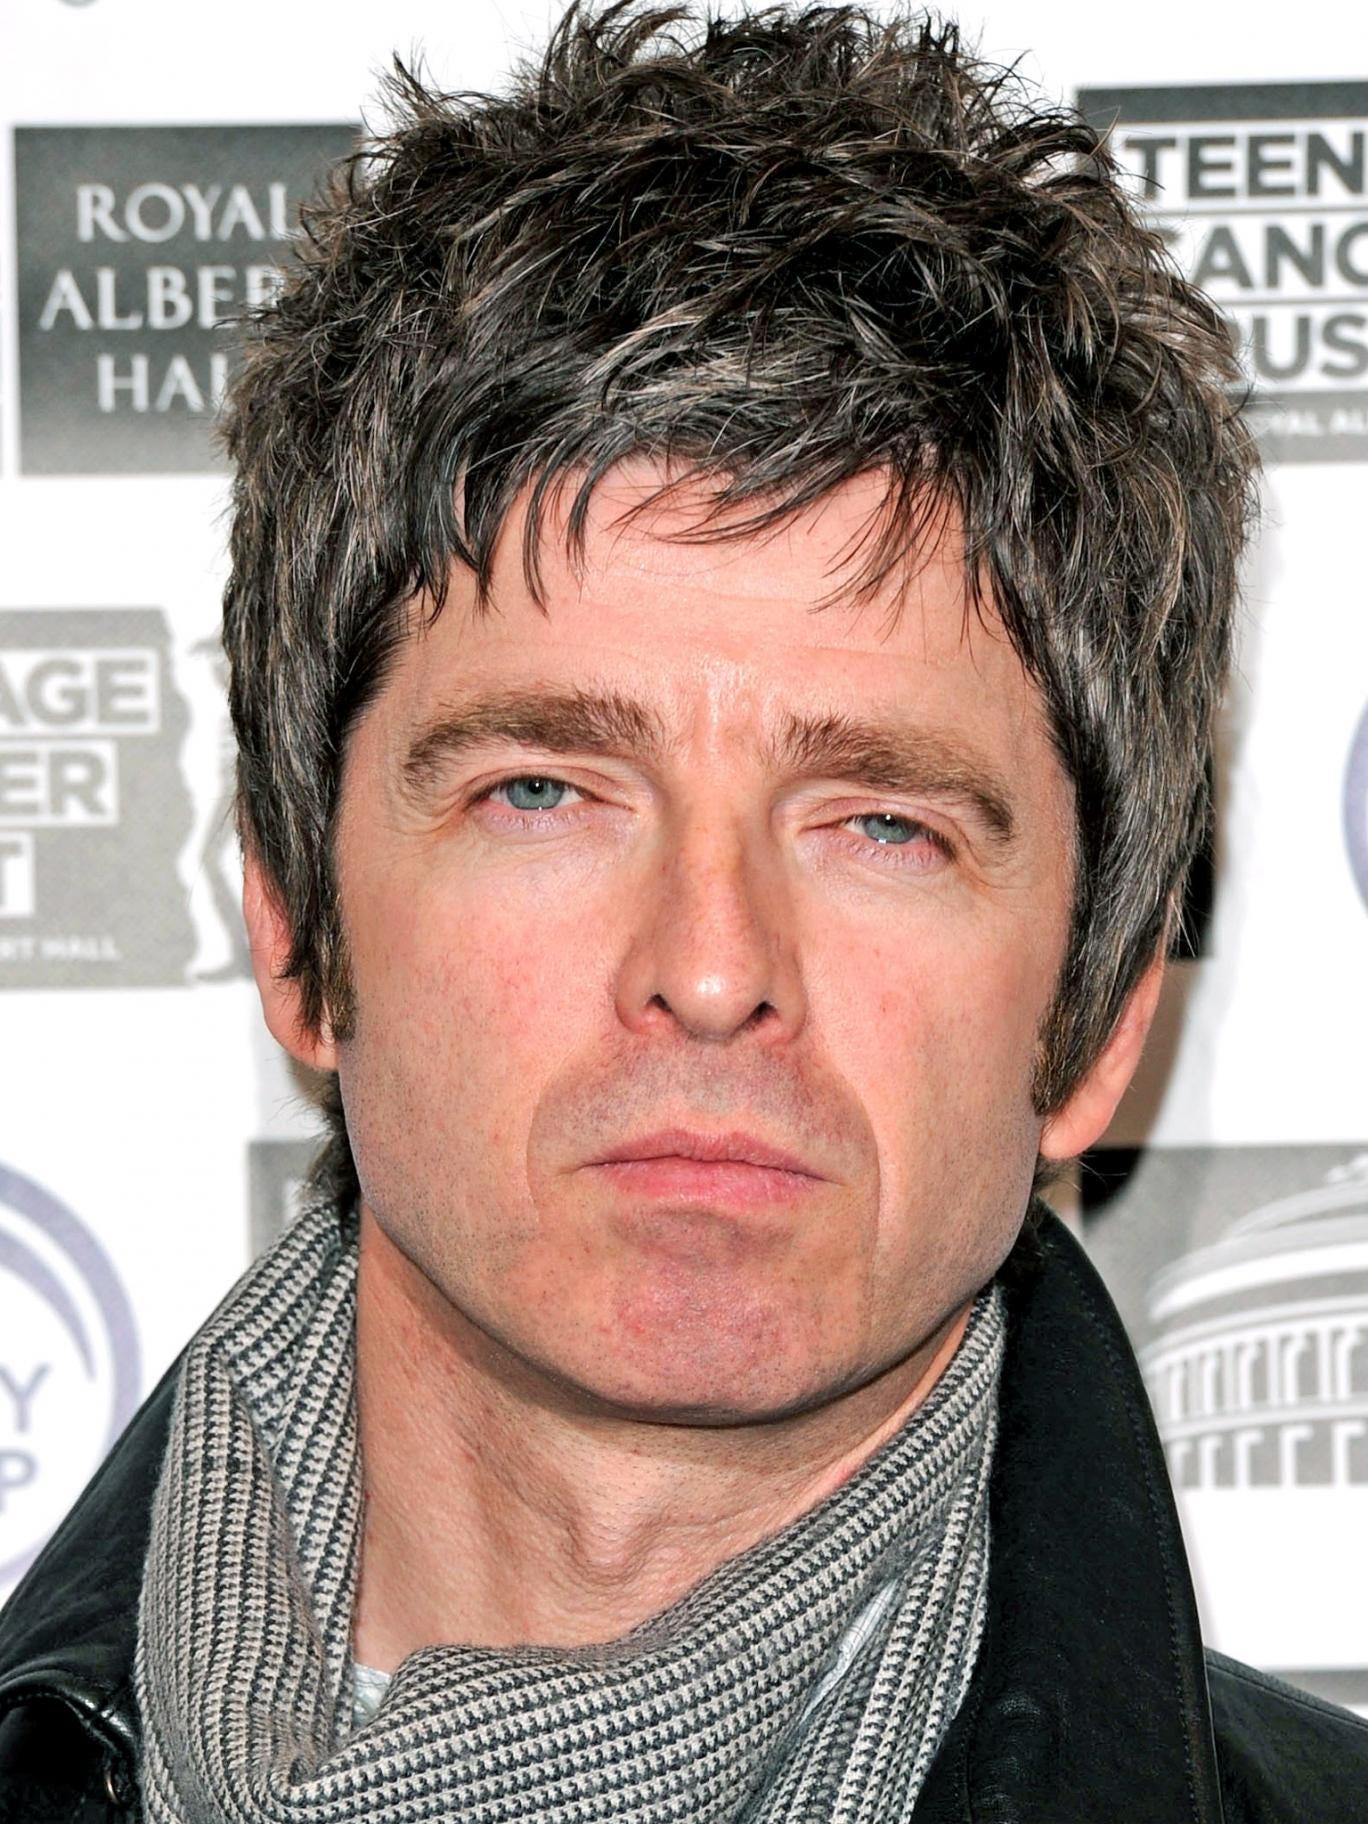 Oasis songwriter Noel Gallagher